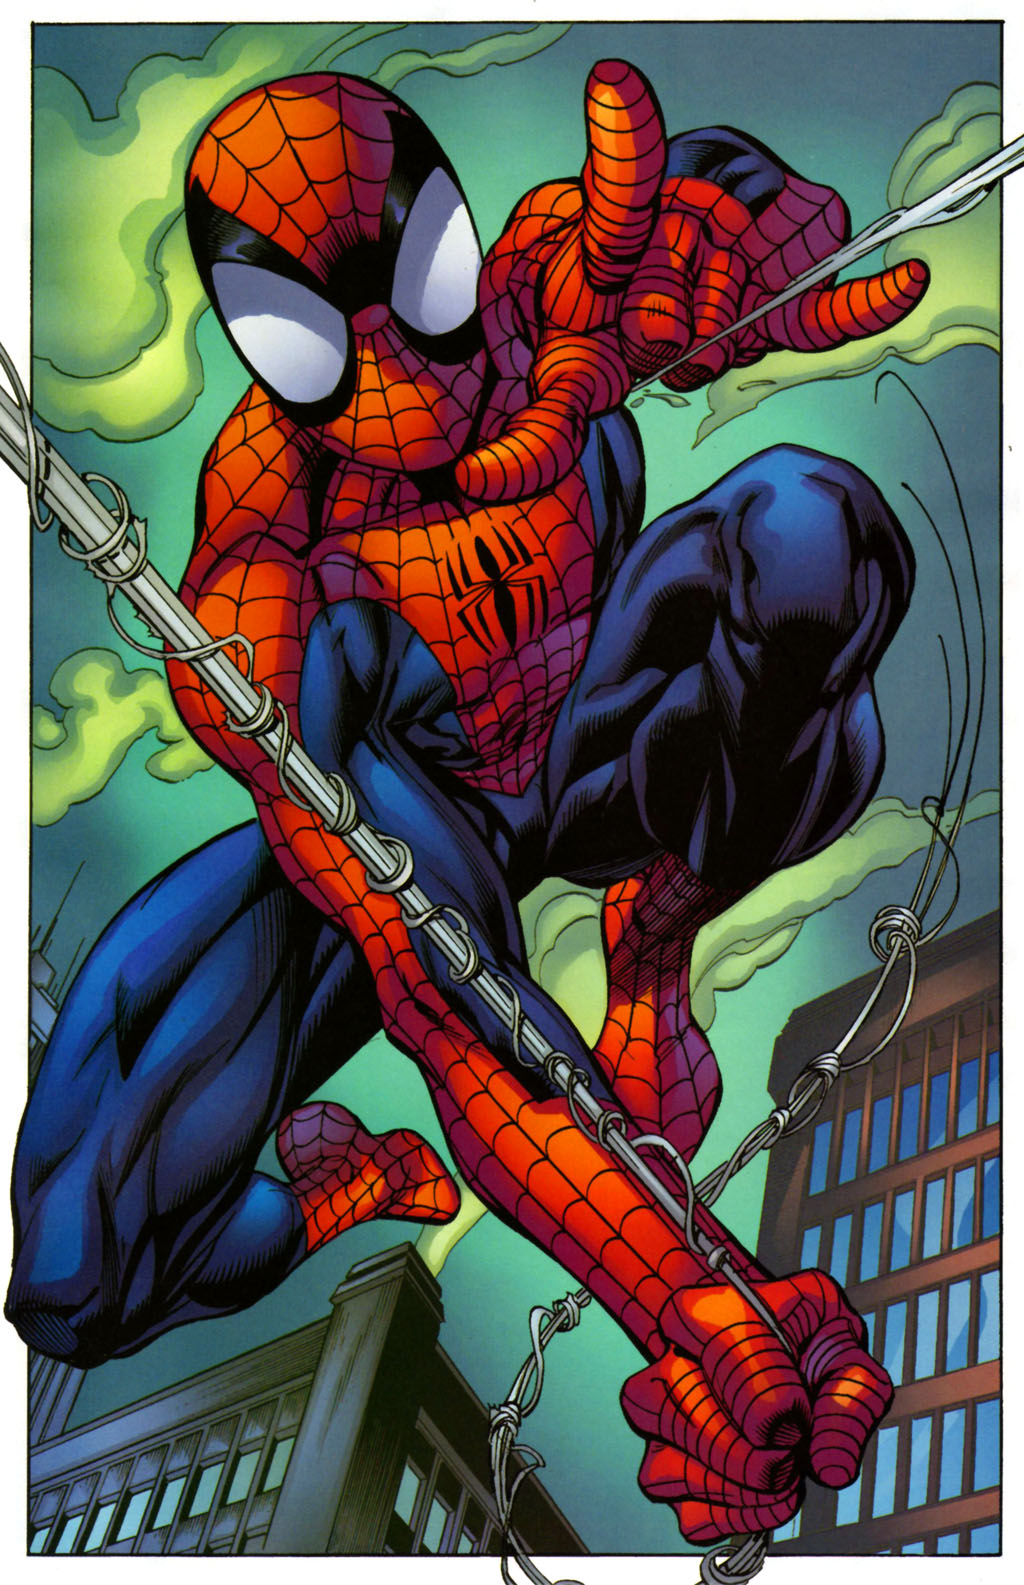 My Top 5 Spider Man Artists